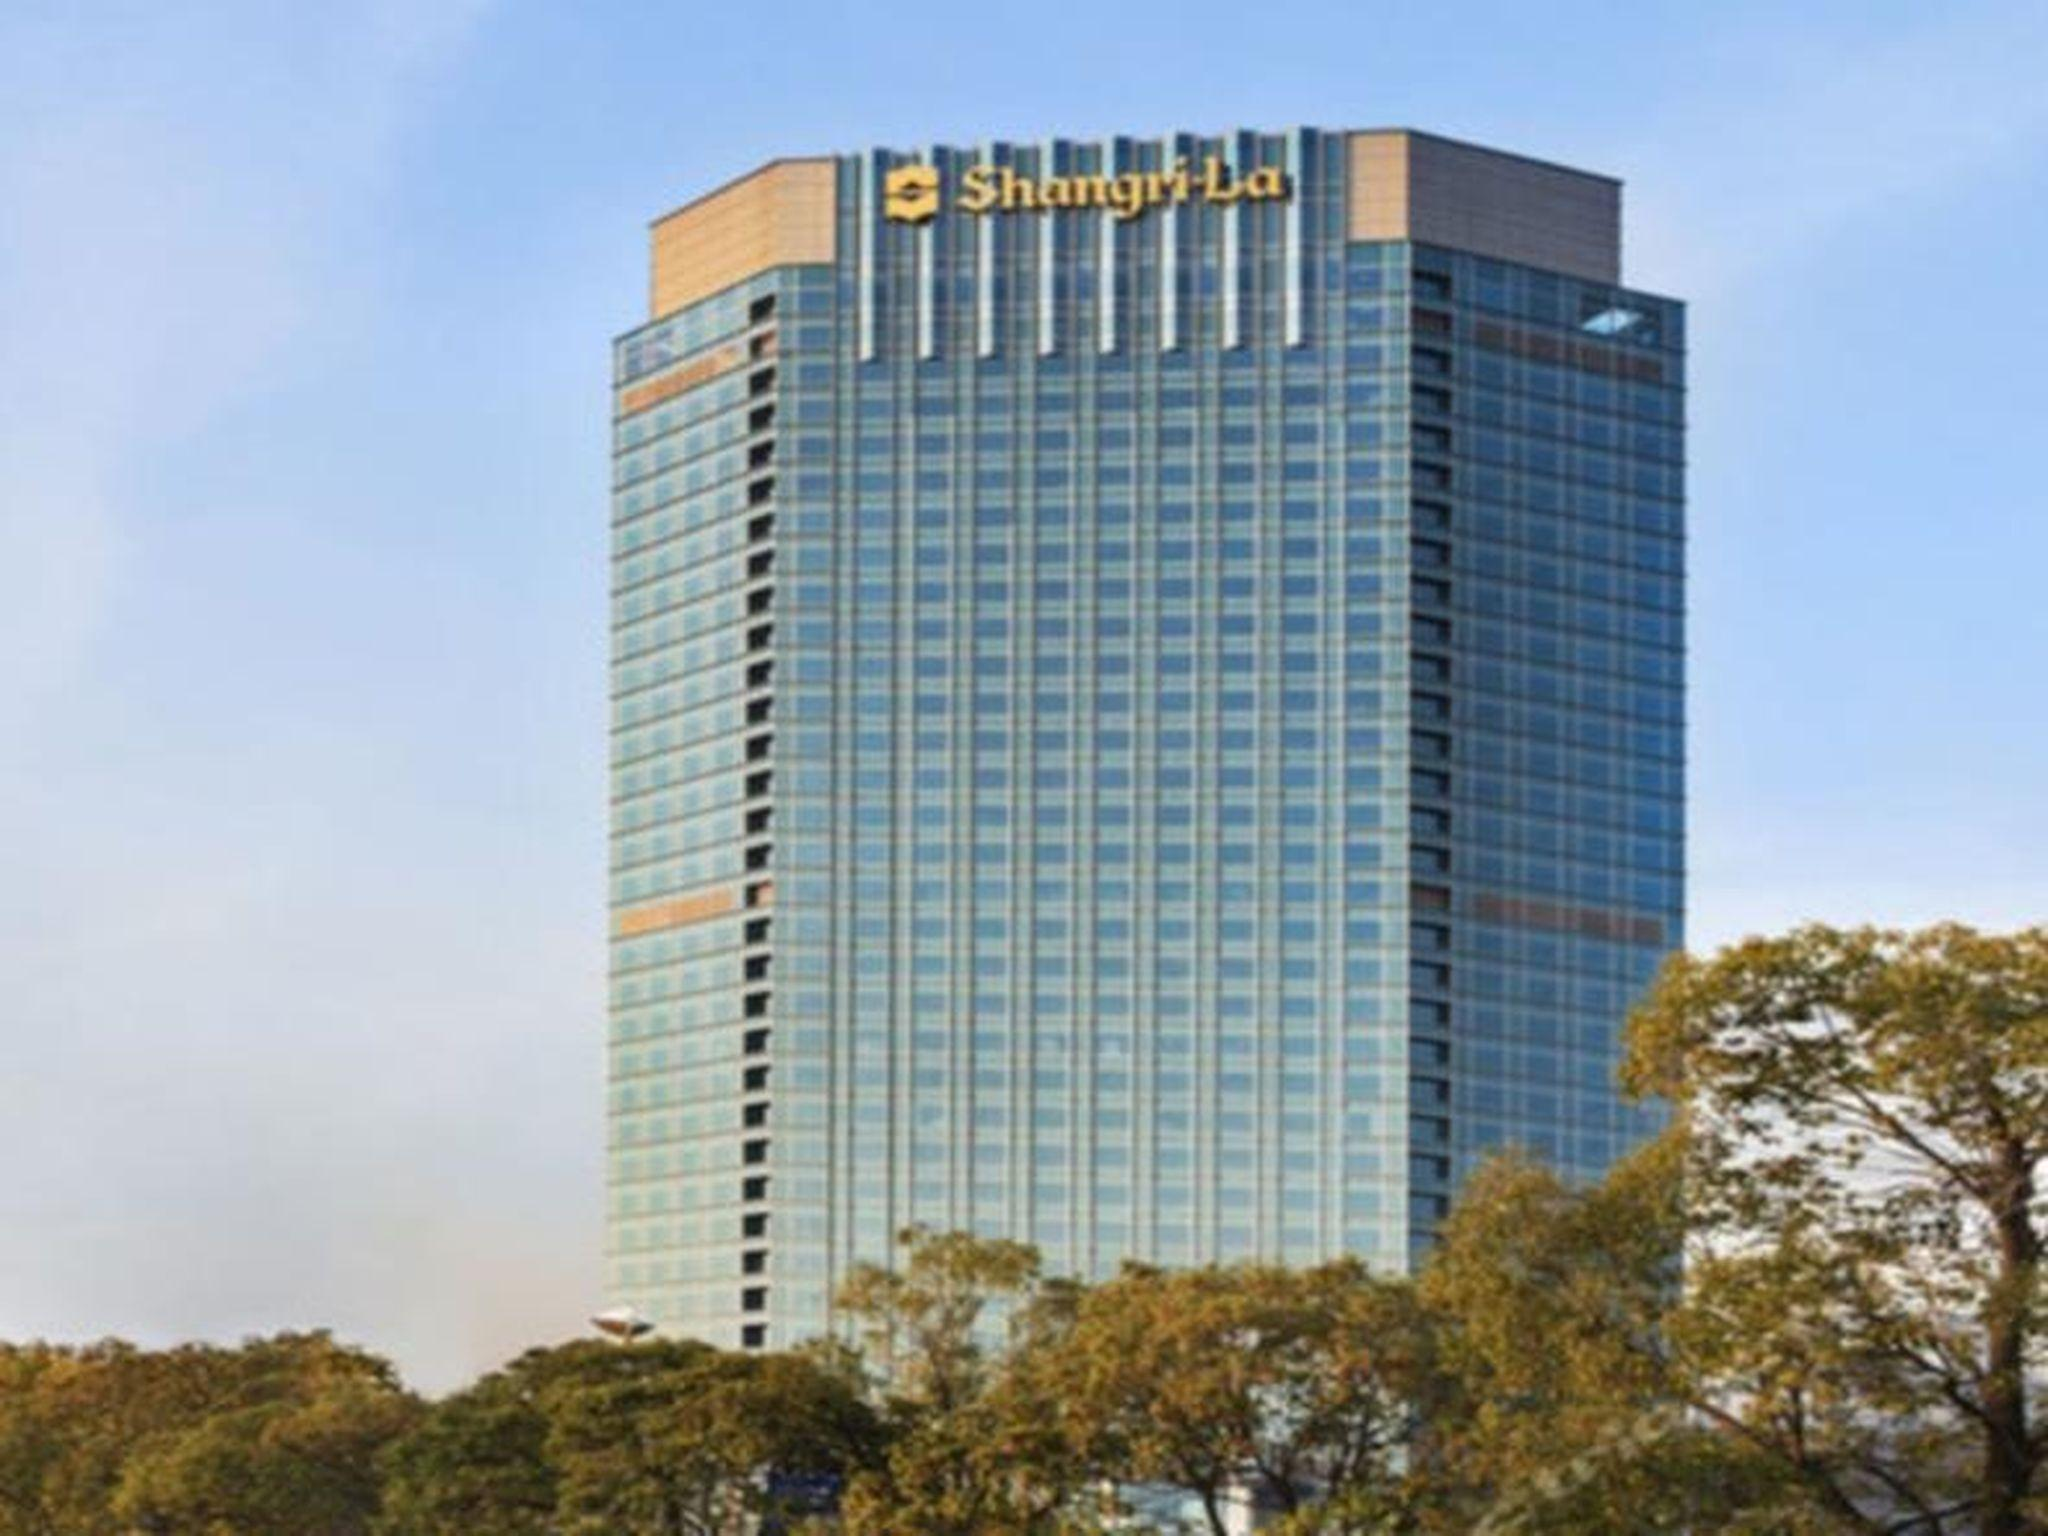 Shangri La Hotel Nanchang